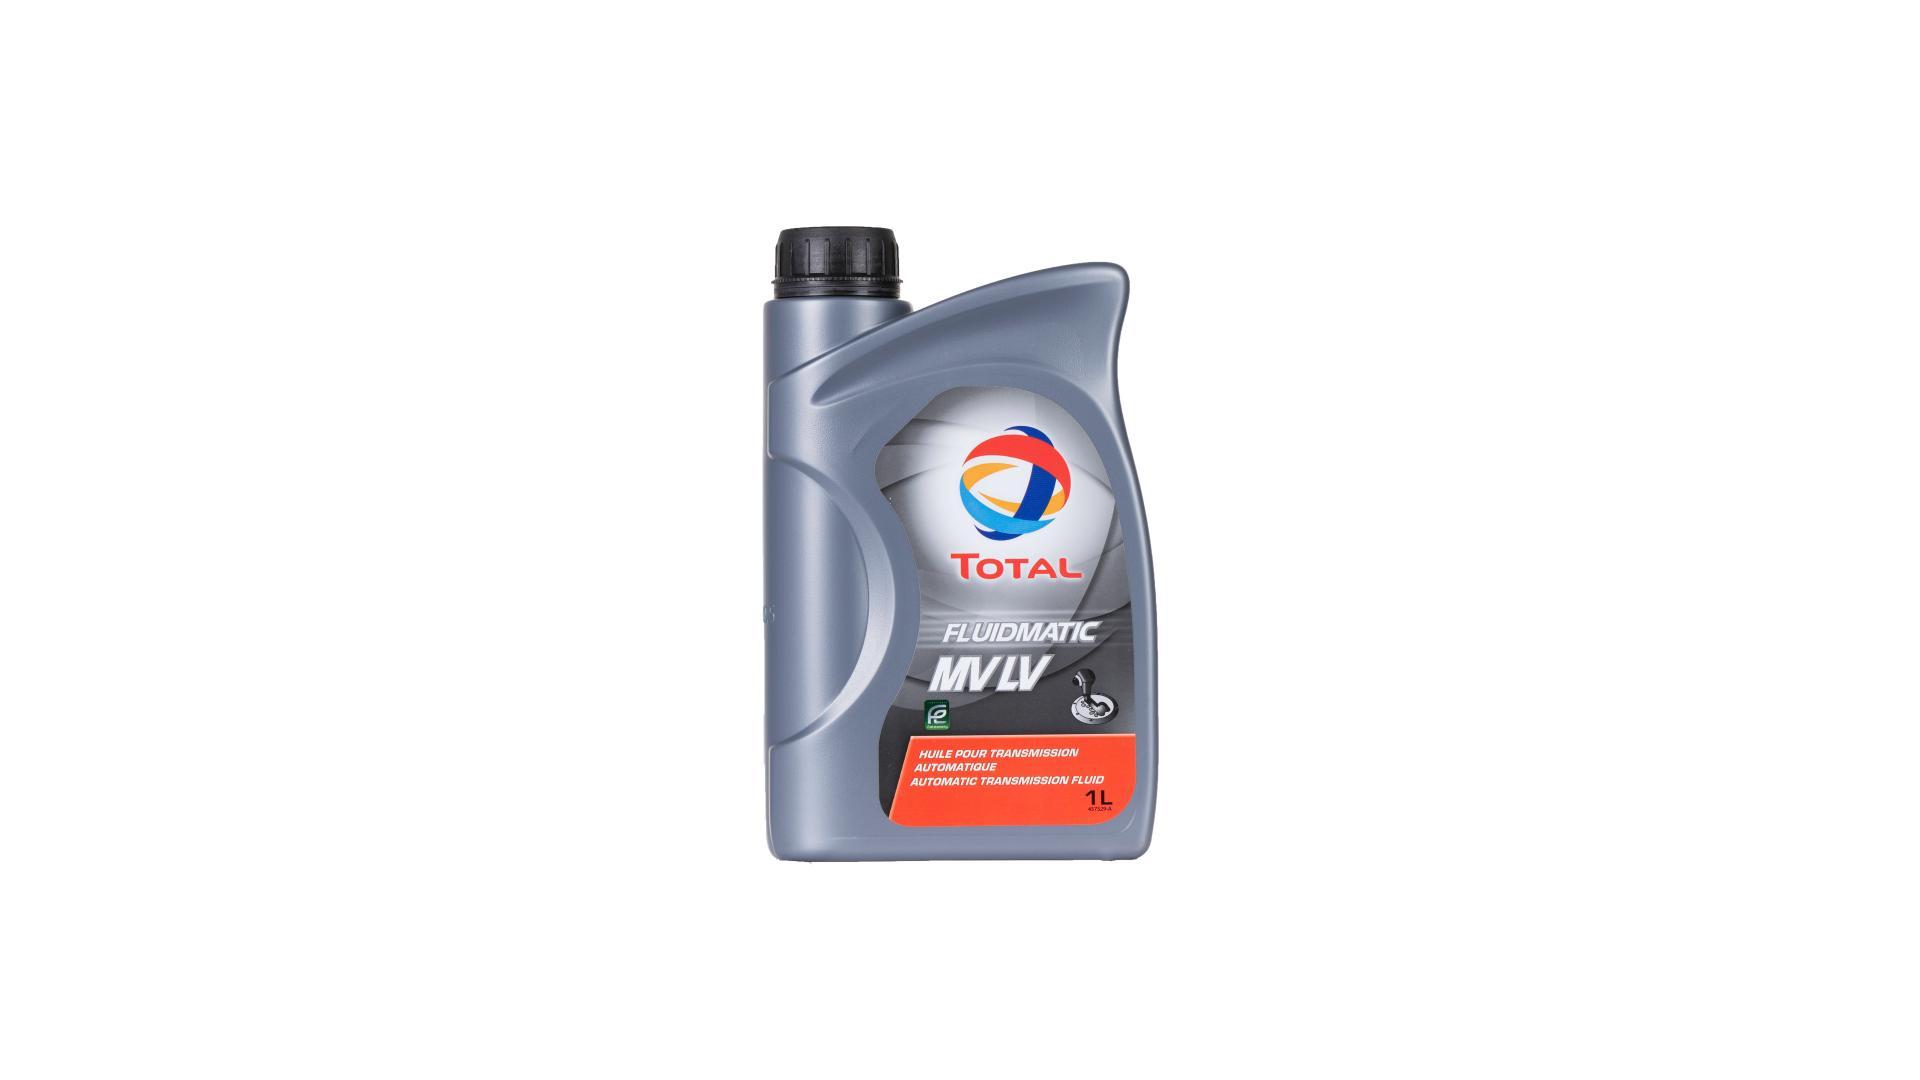 Total Fluidmatic MVLV (199475)